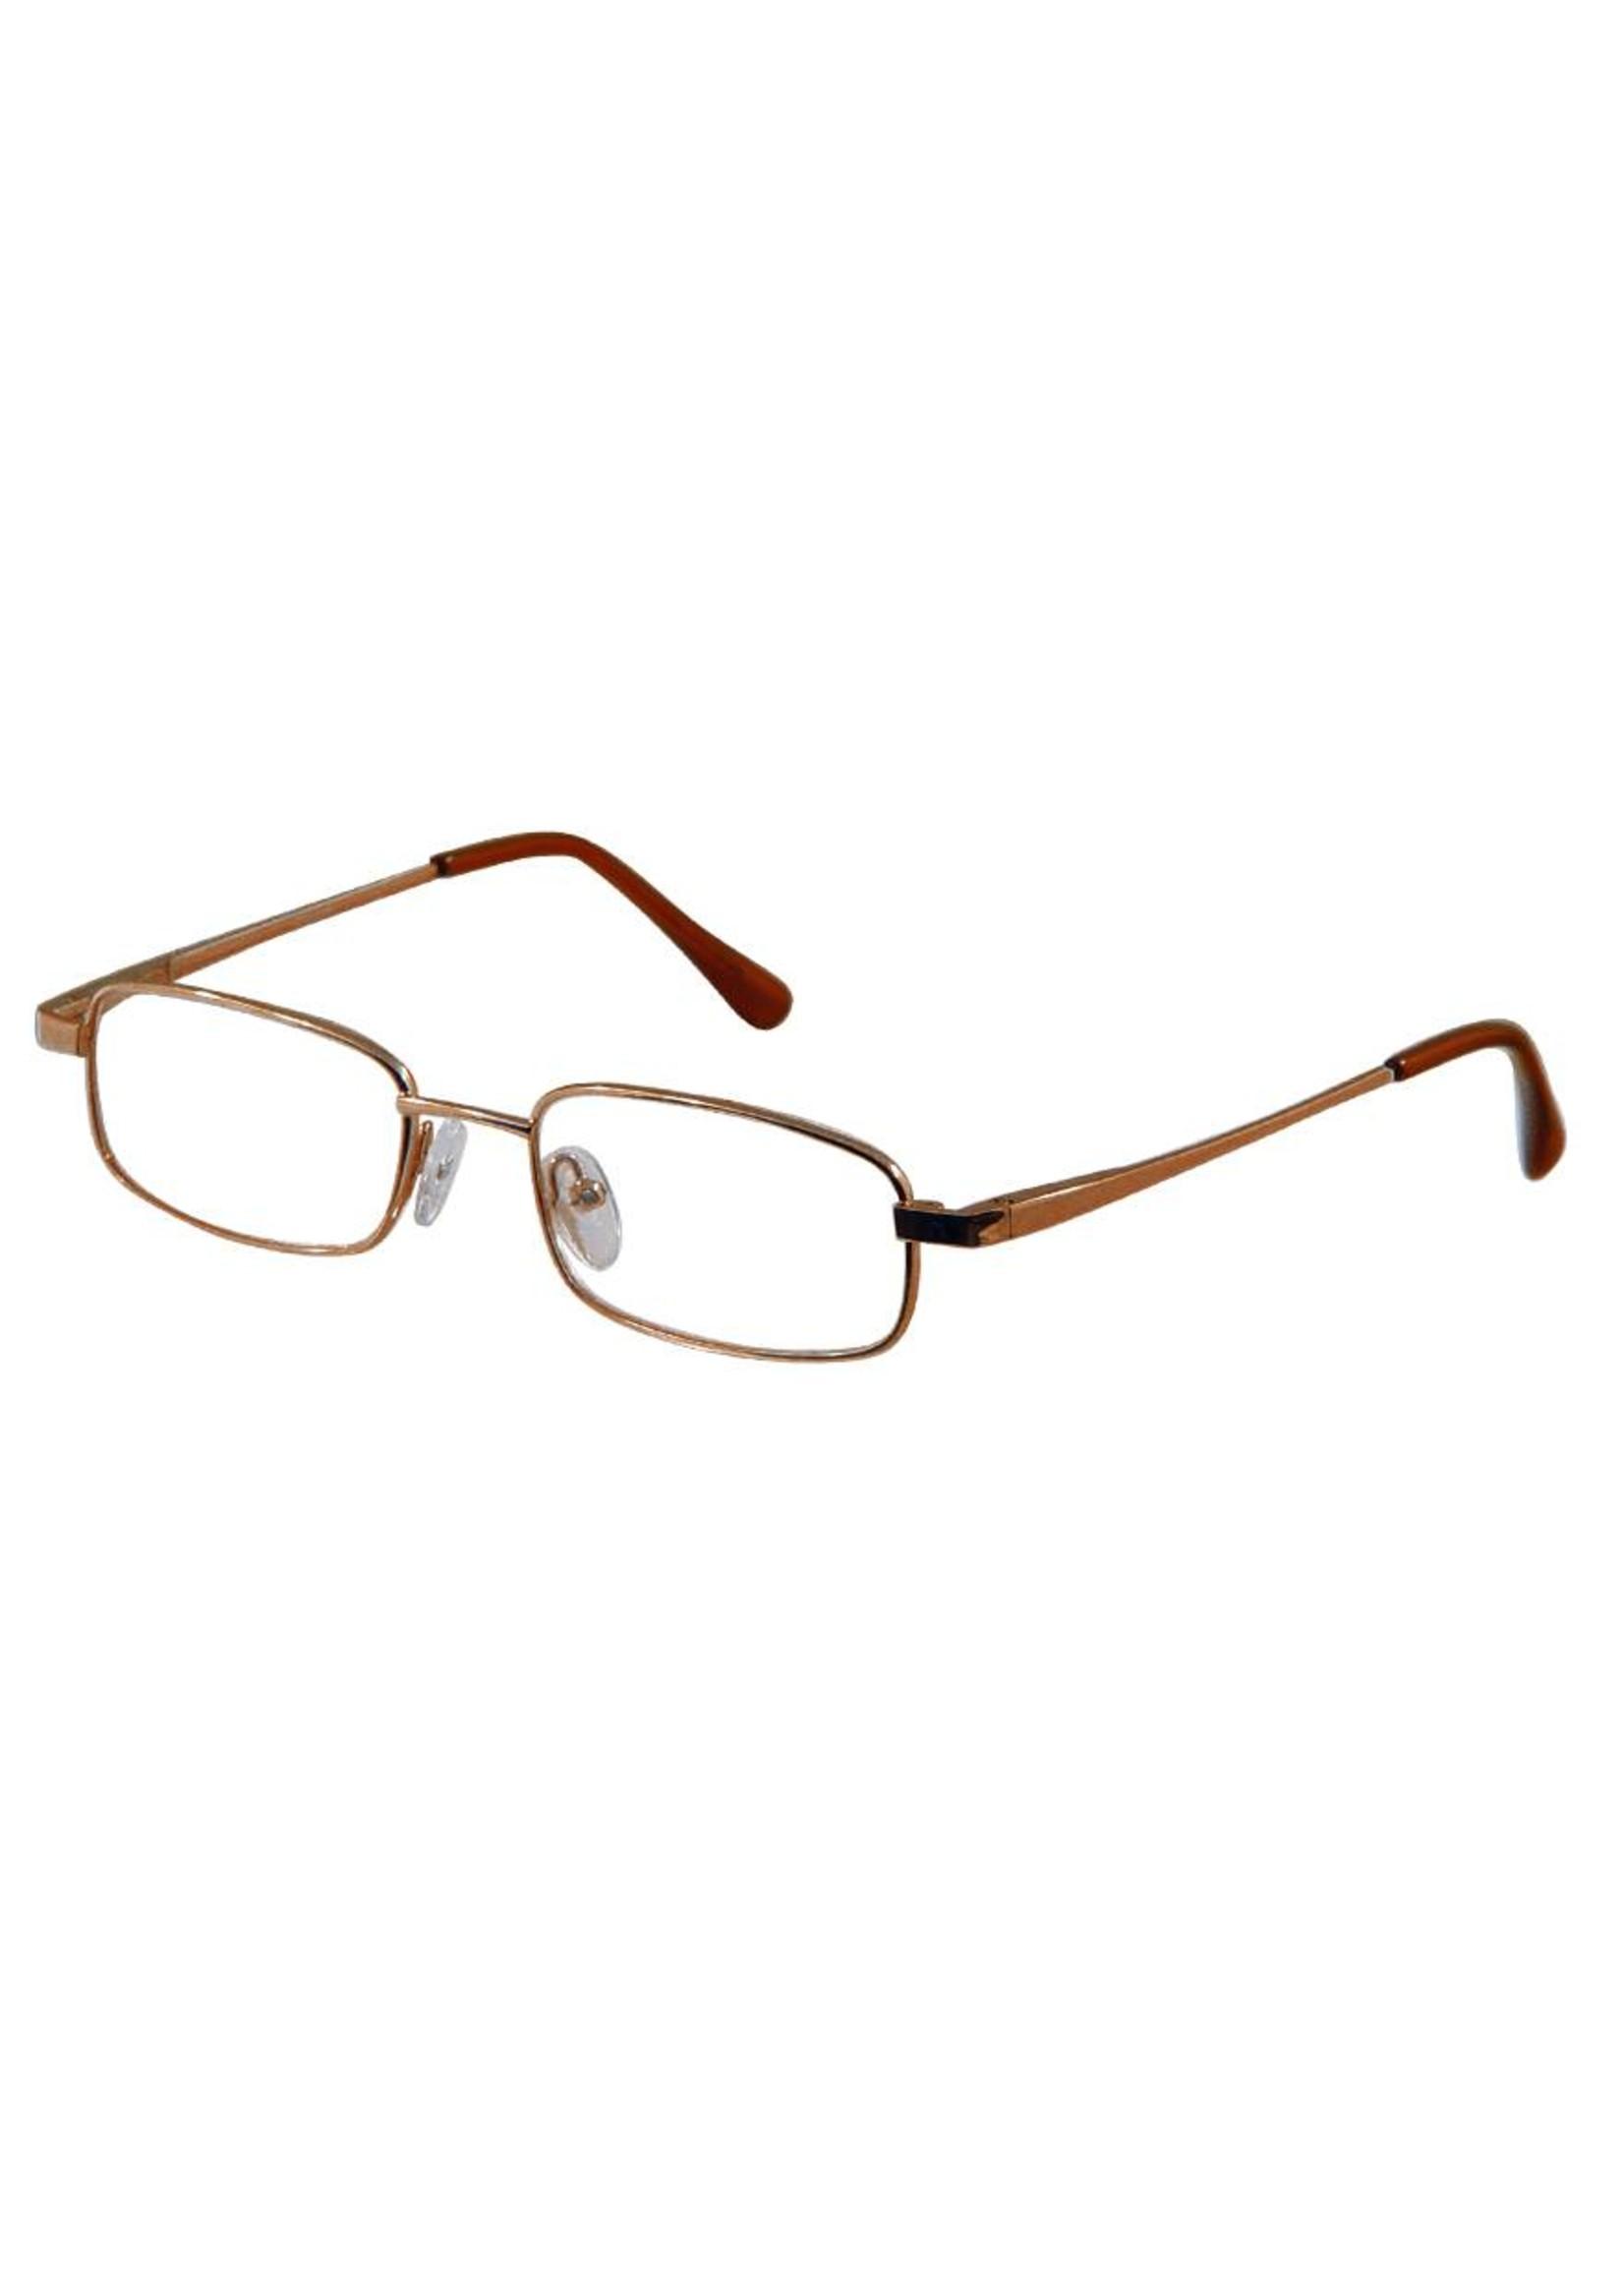 Basic Leesbril Leo 115 in Brons met flex-veren